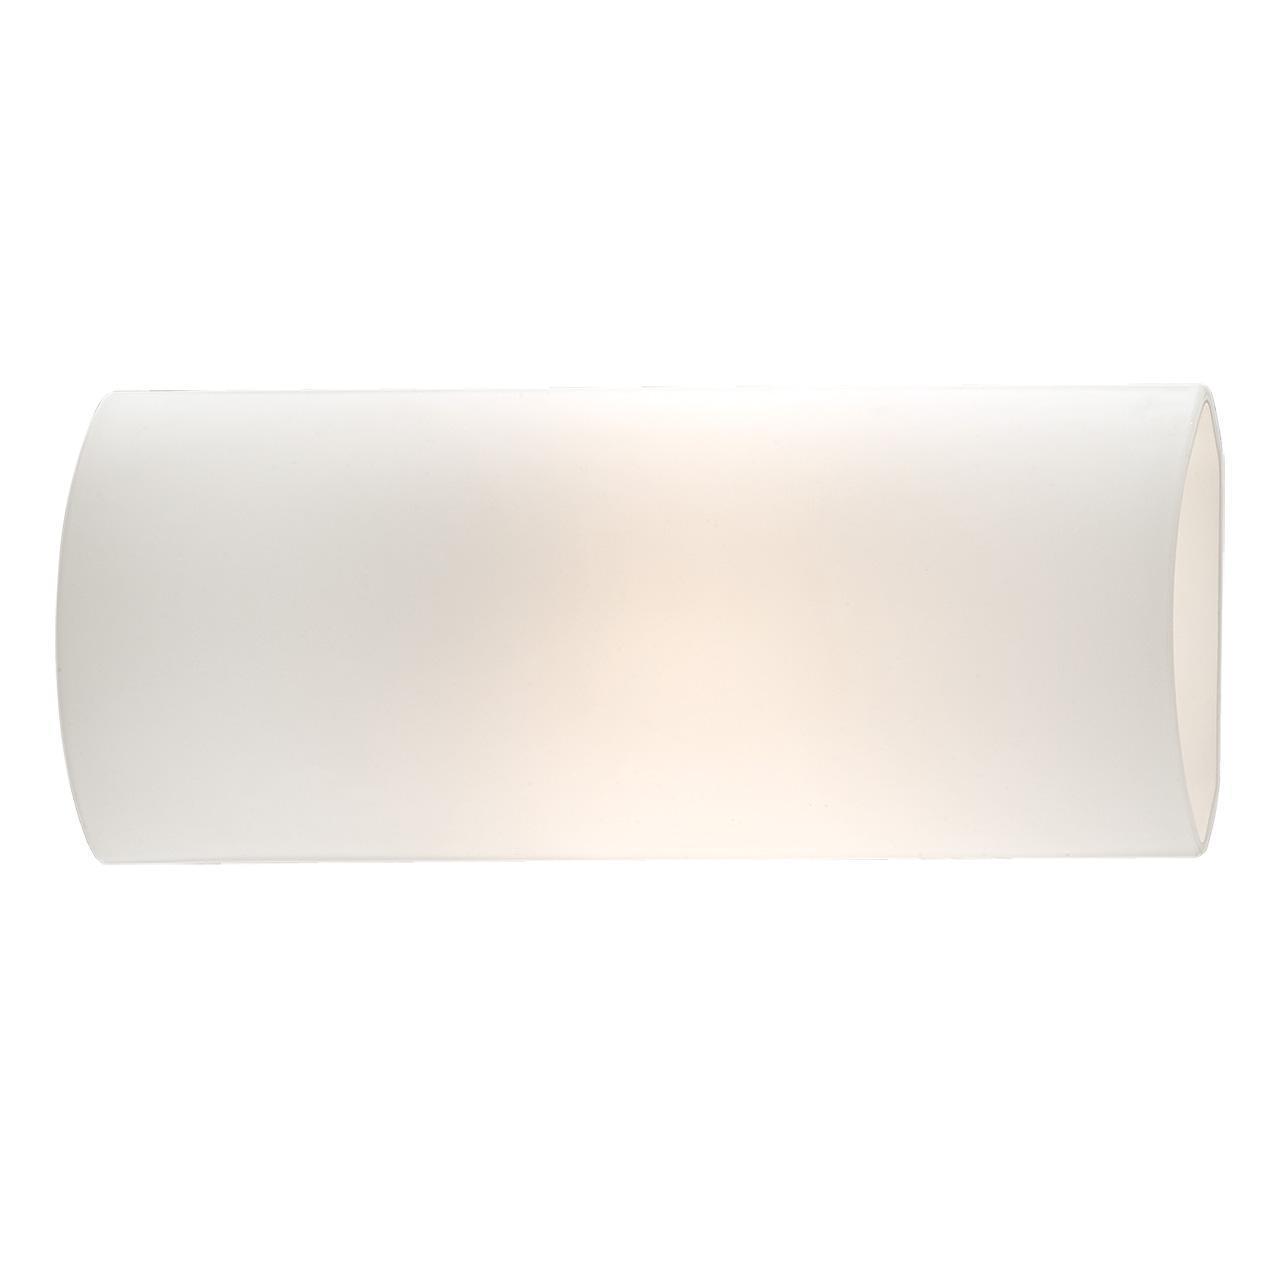 Настенный светильник Odeon Light Dion 2042/2W бра colosseo susanna 80311 2w